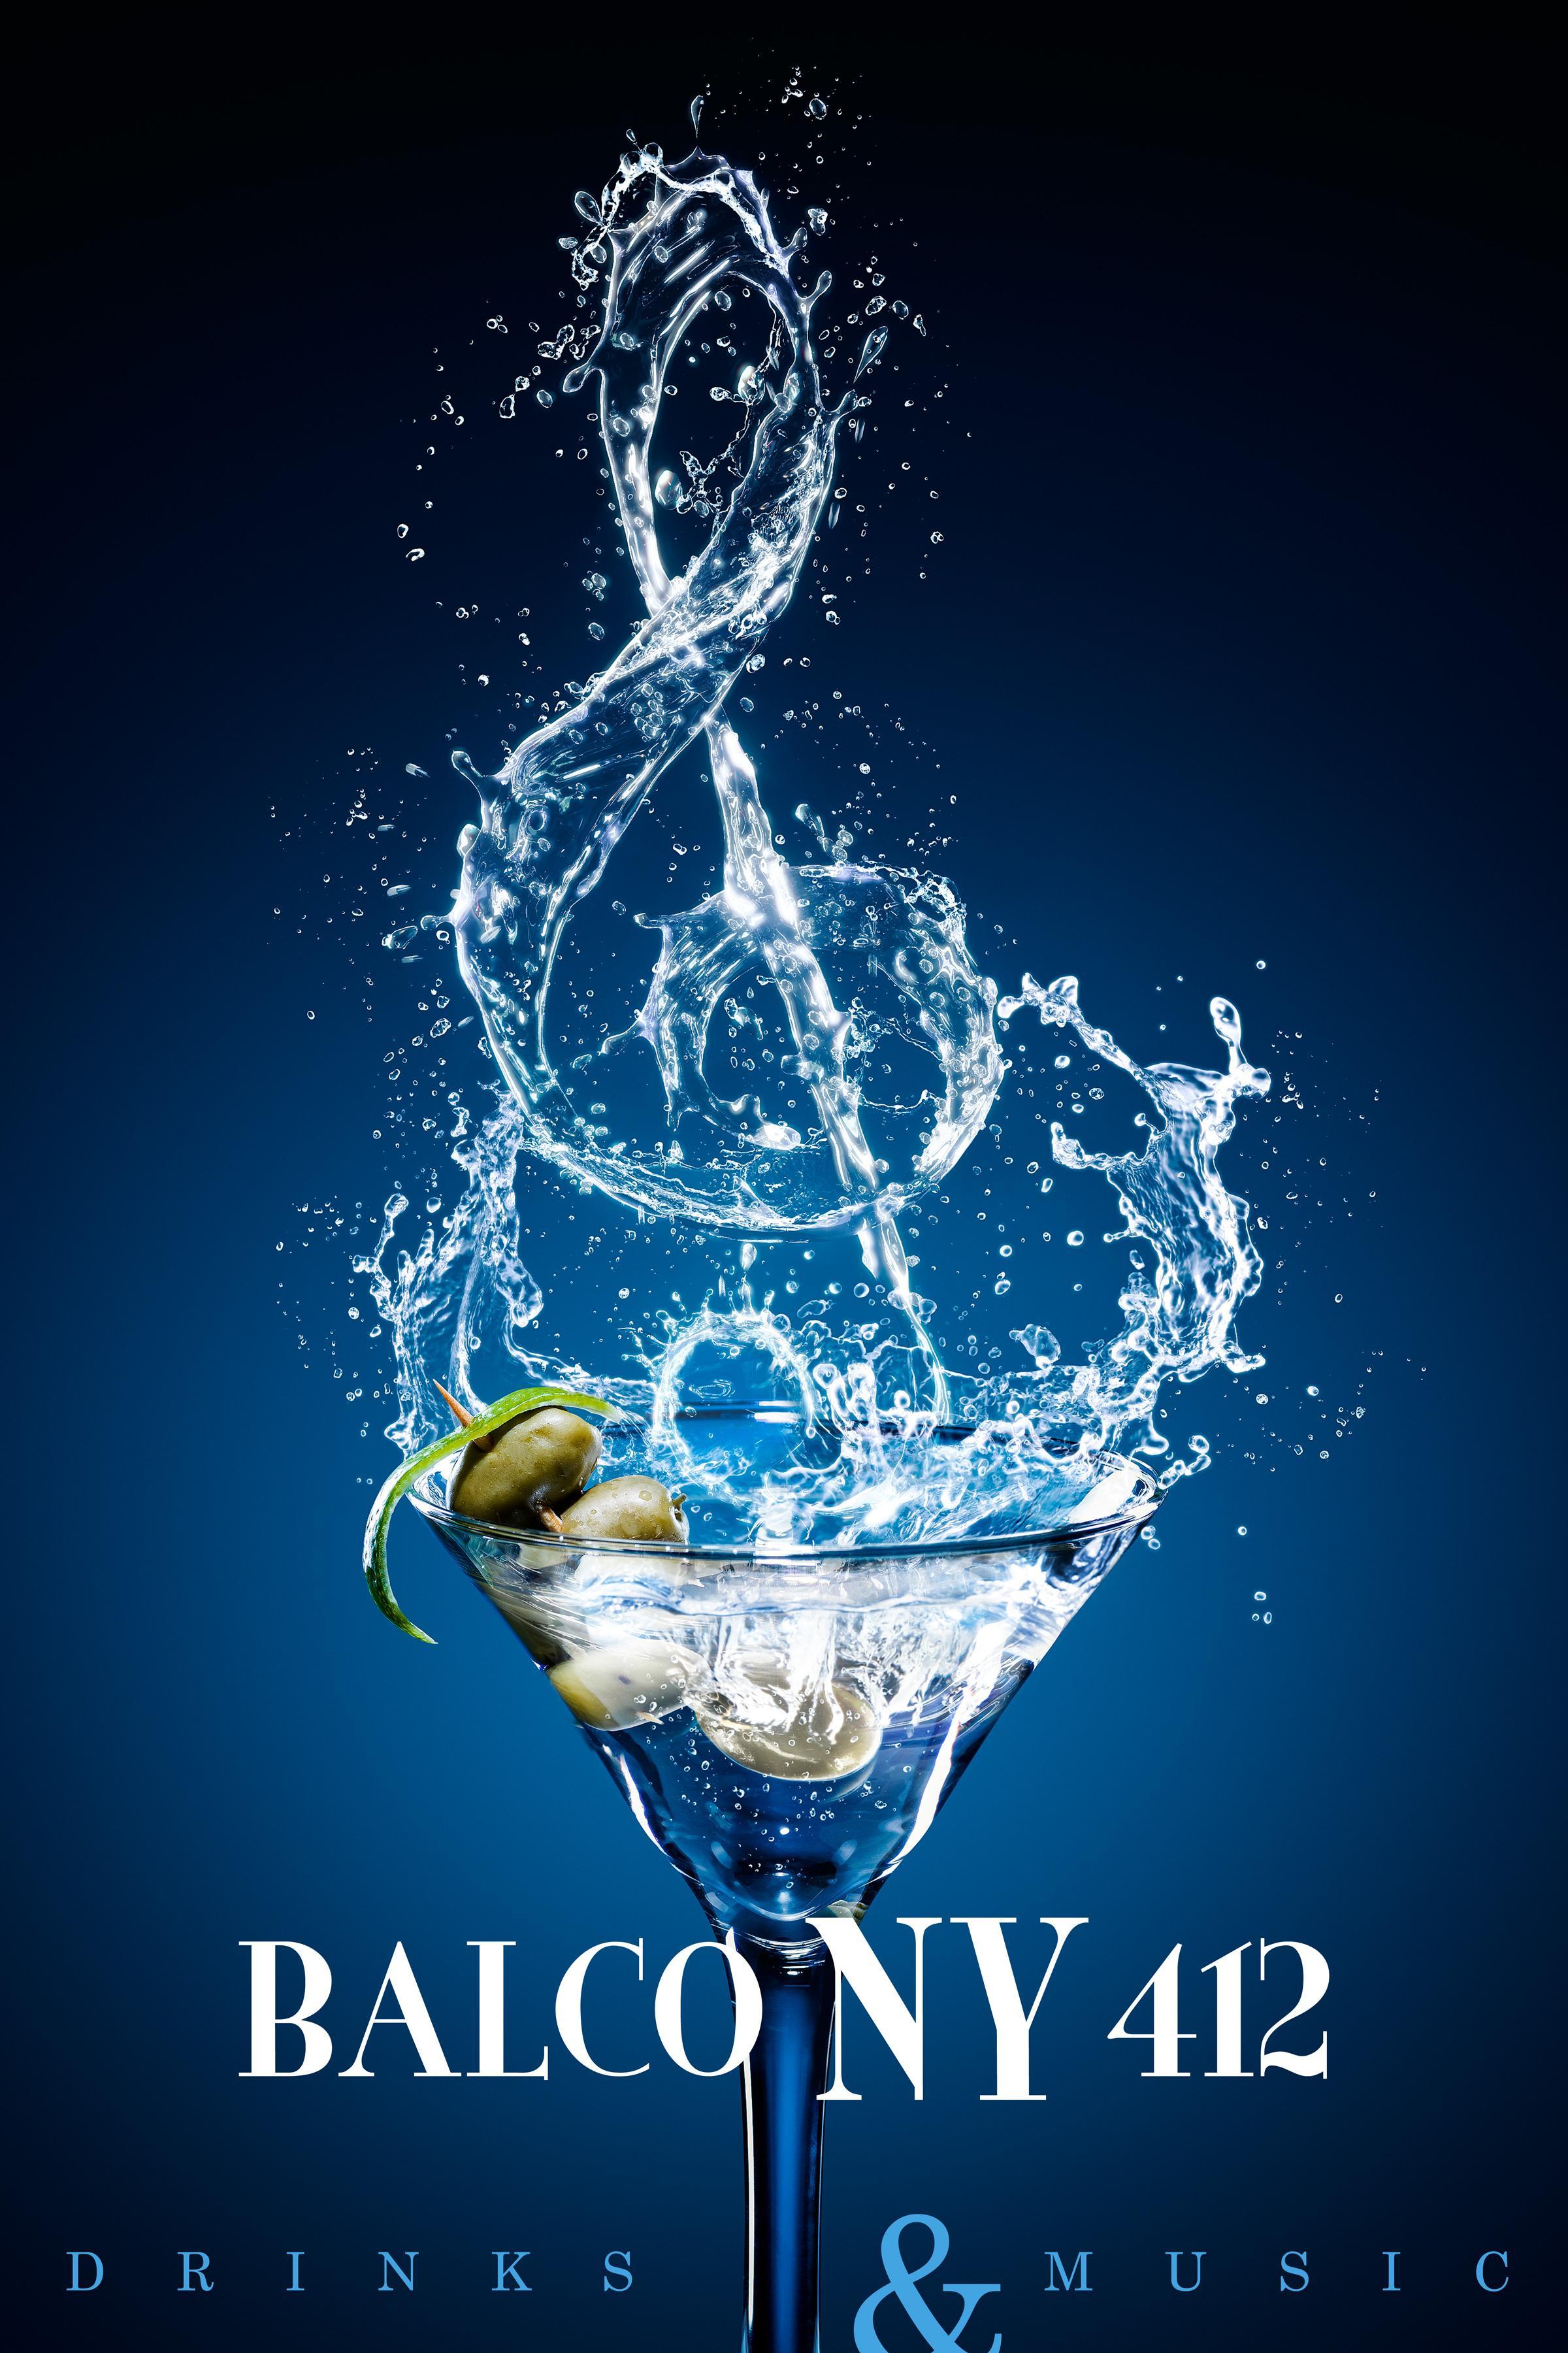 BalcoNY 412 Print Ad - Drinks & Music, 2